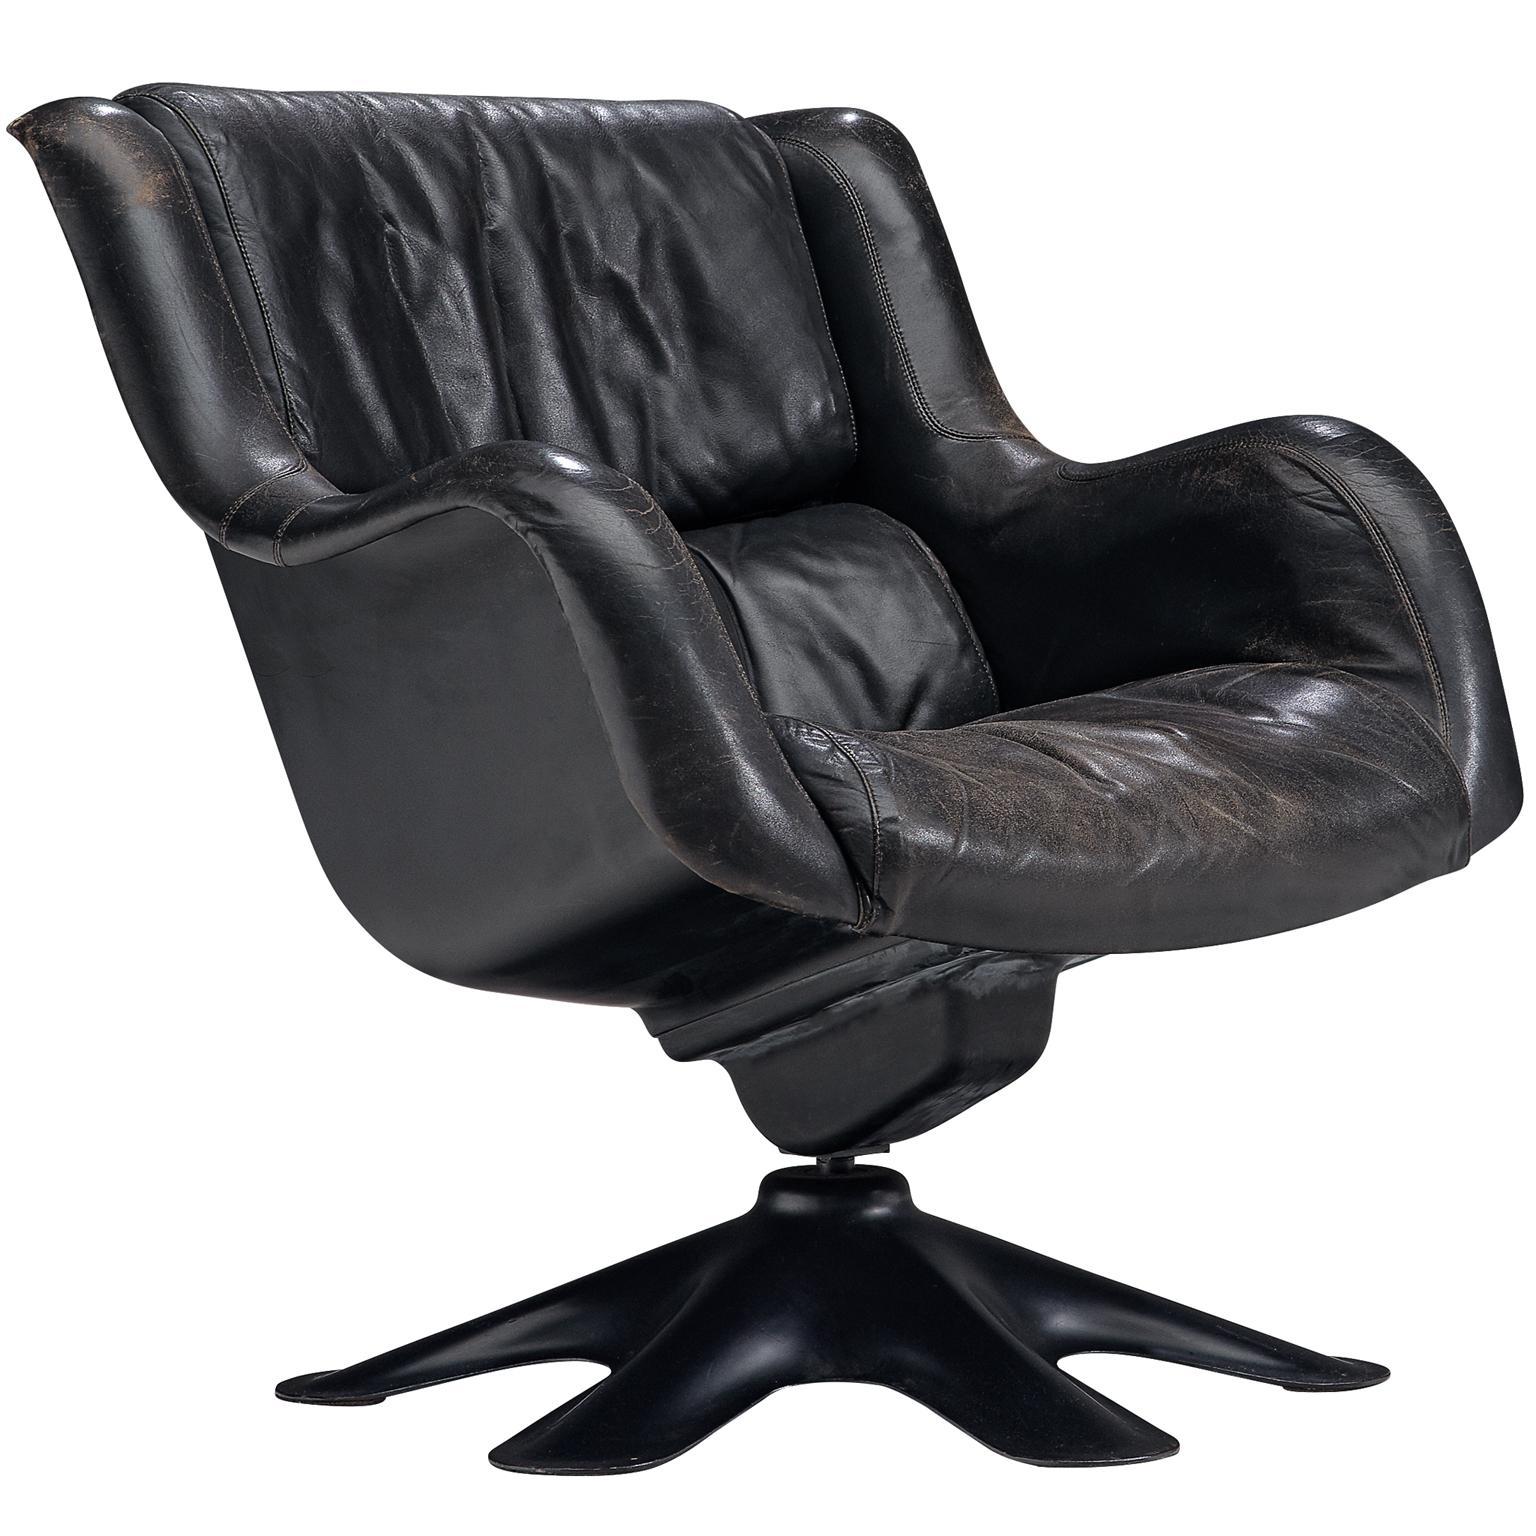 Yrjo Kukkapuro 'Karuselli' Lounge Chair in Black Patinated Leather